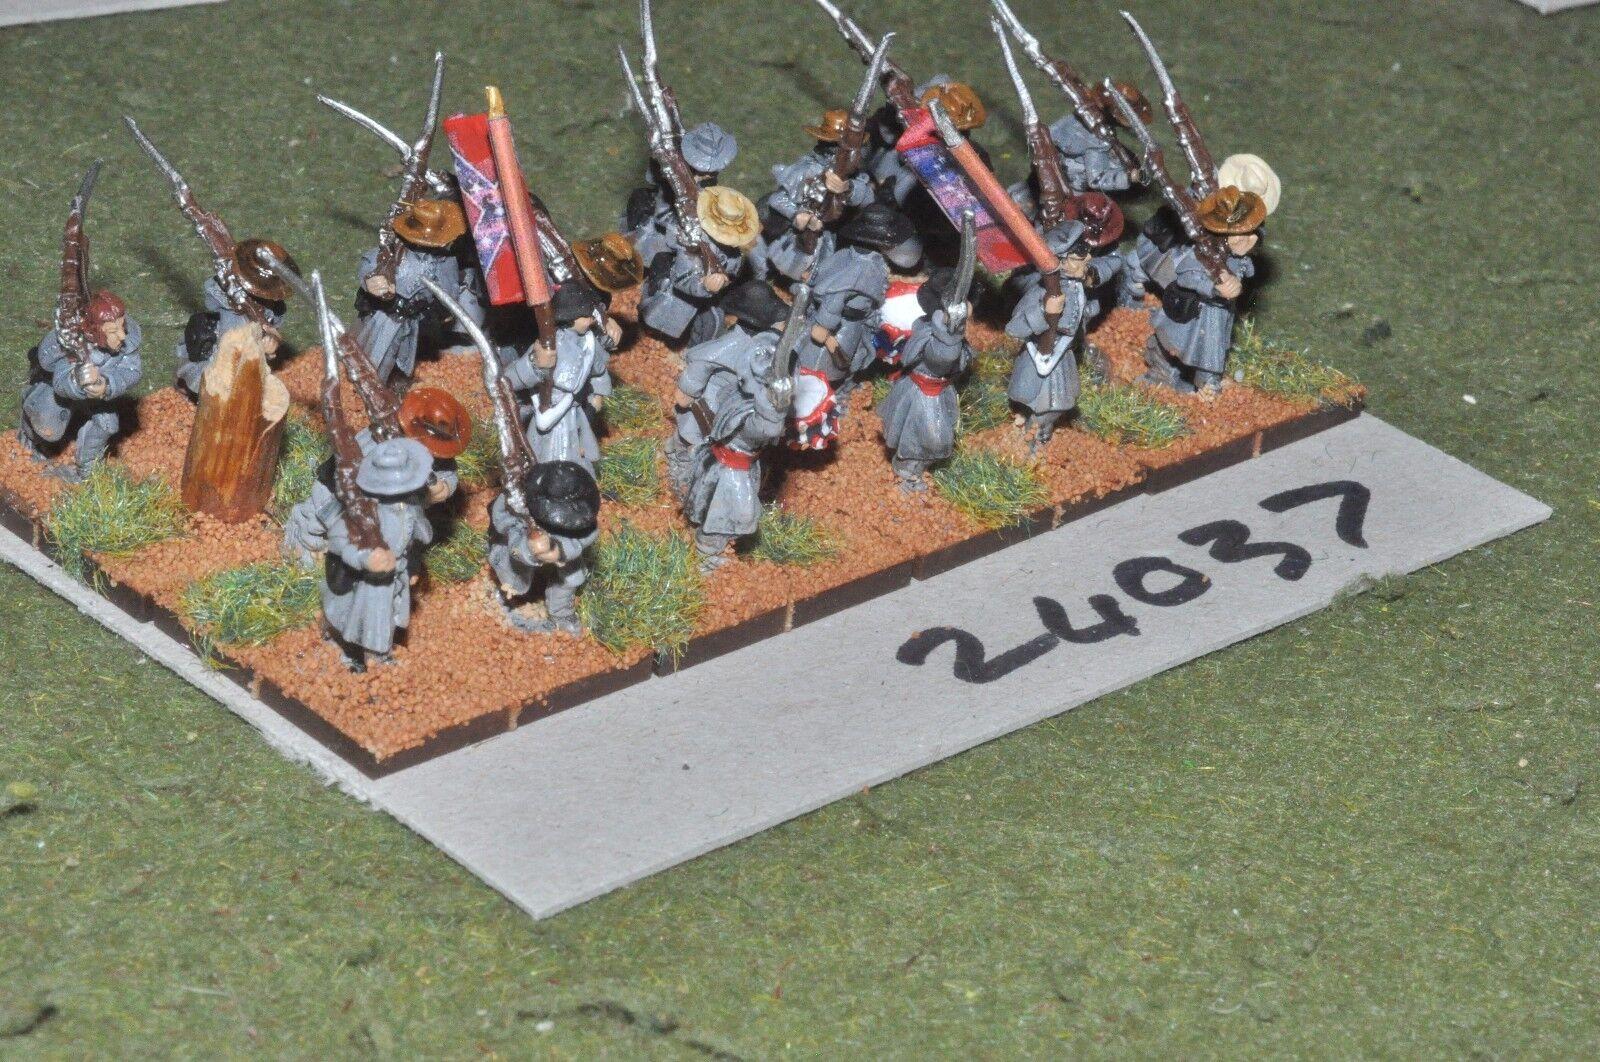 15mm ACW   confederate - regiment 24 figures - inf (24037)